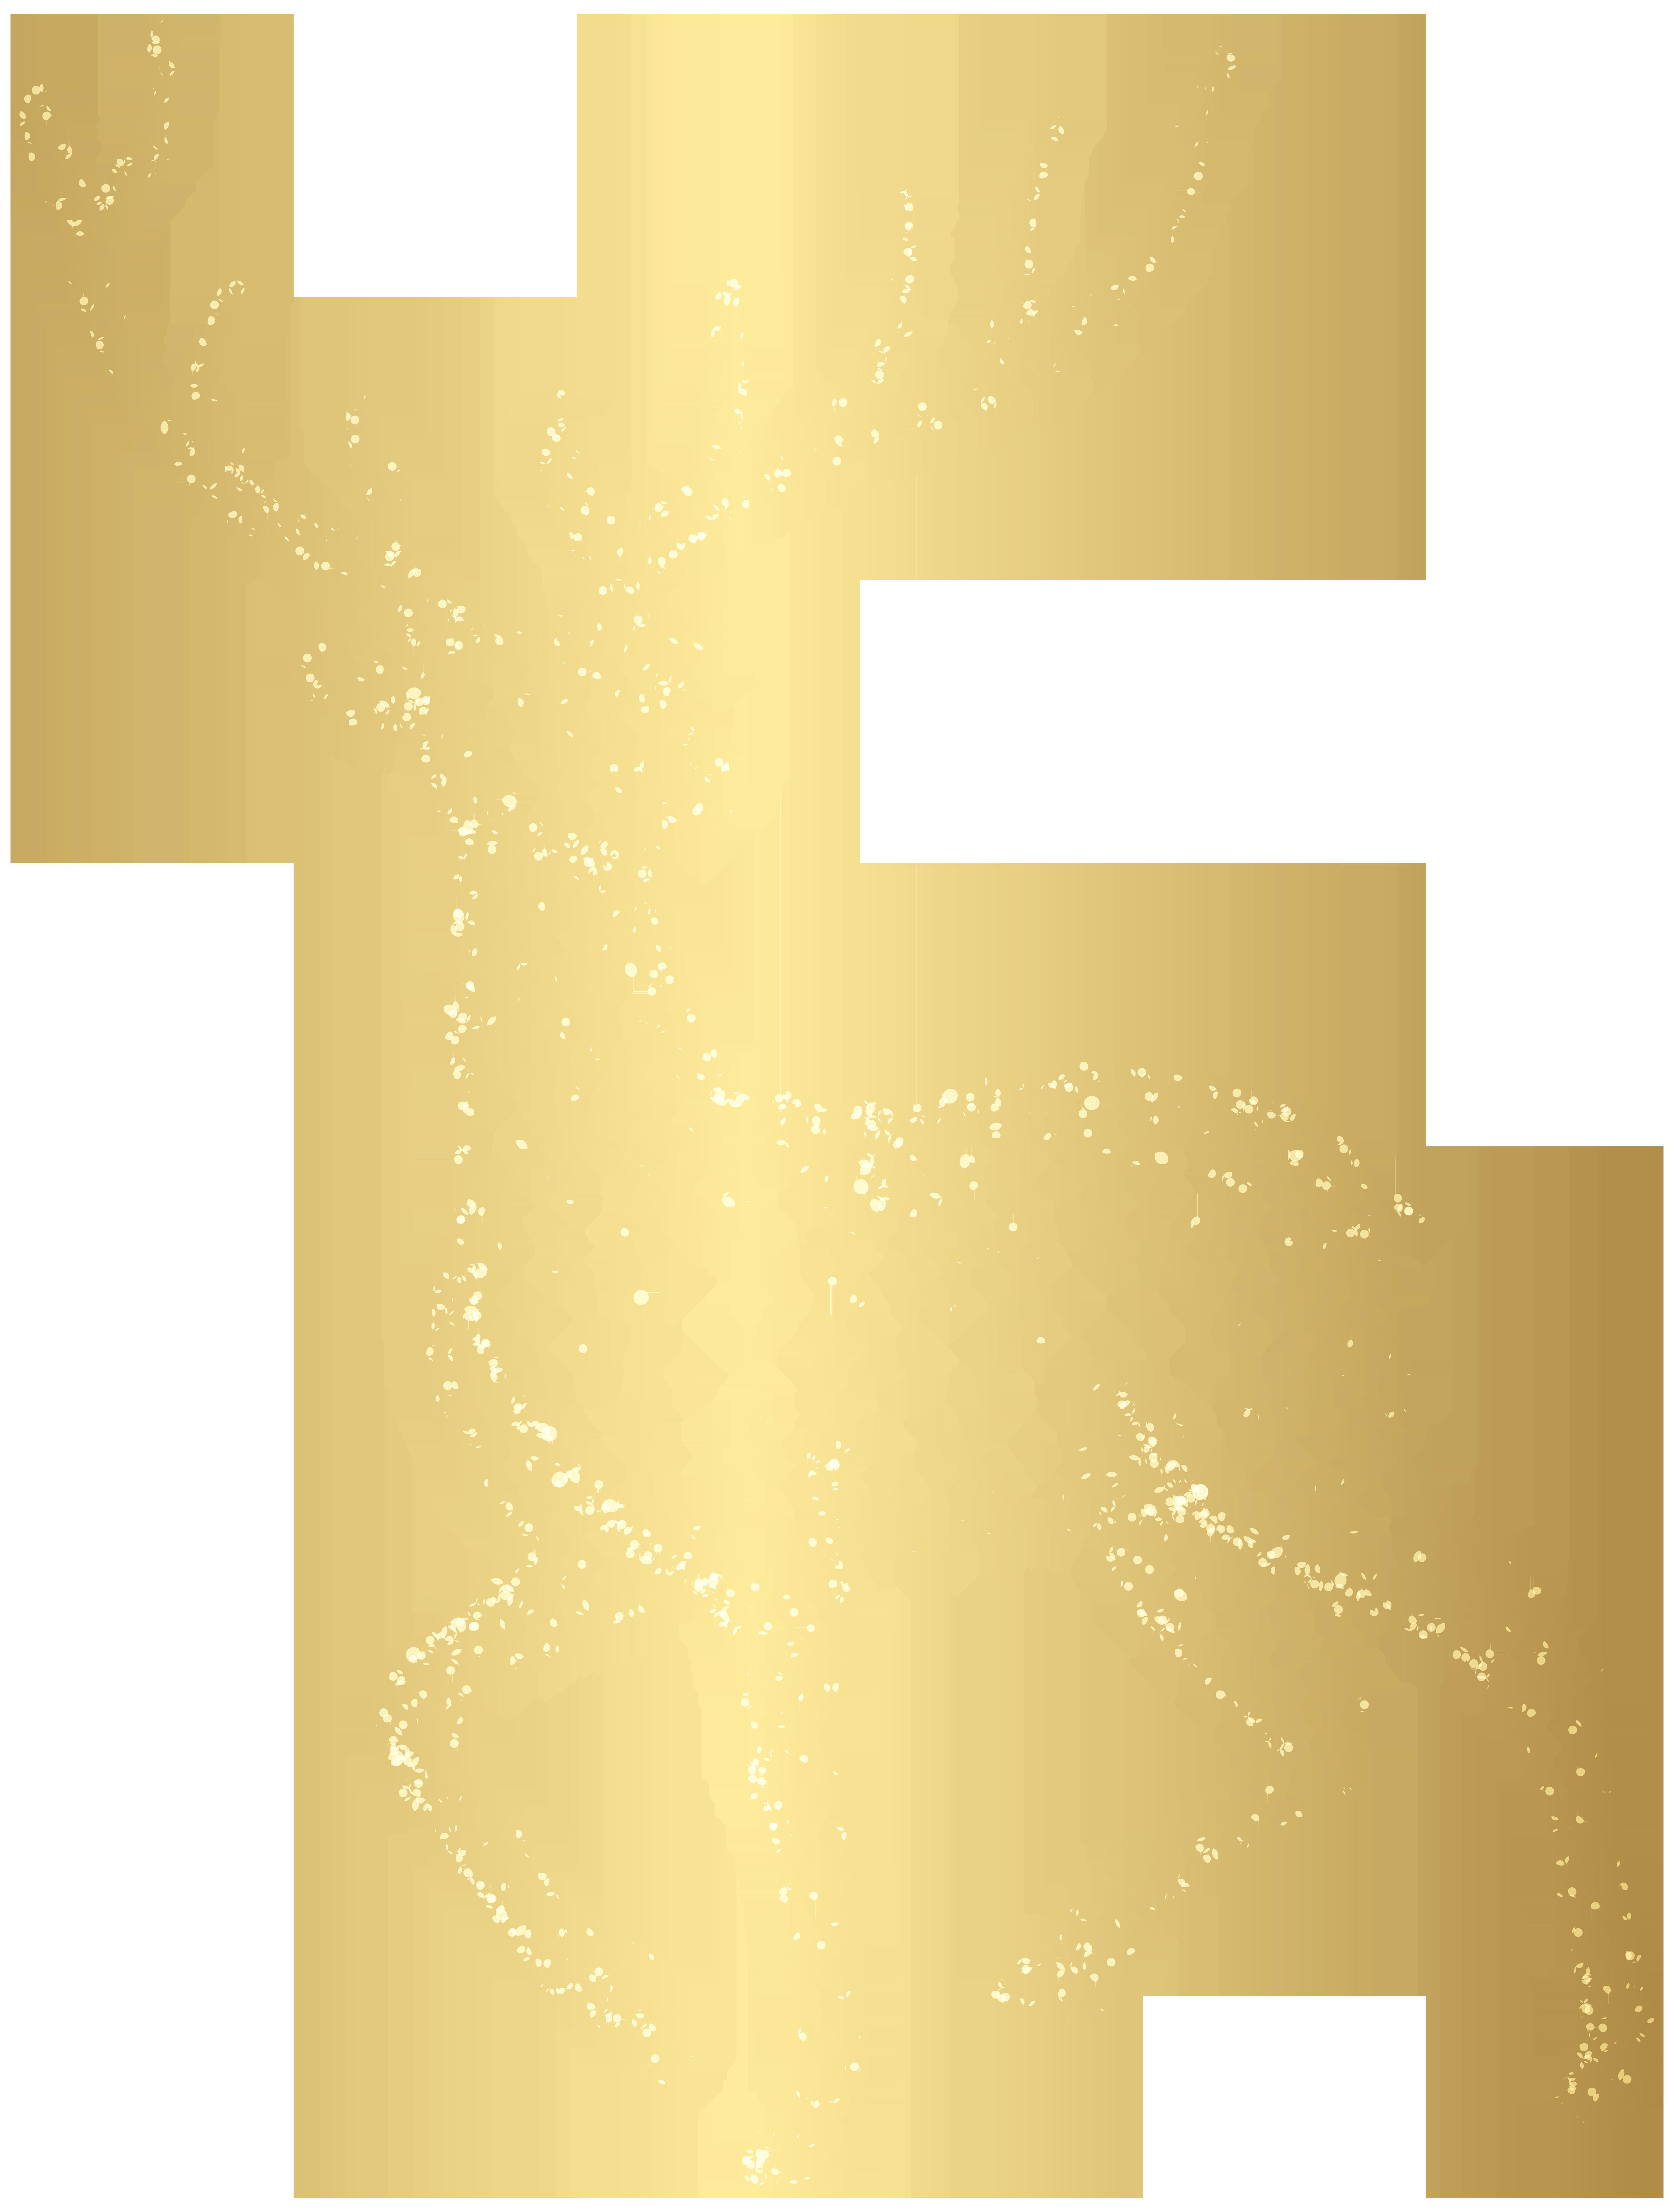 Christmas deer clipart clipart library library Reindeer Visual arts Giraffe Antler Pattern - Christmas Deer ... clipart library library